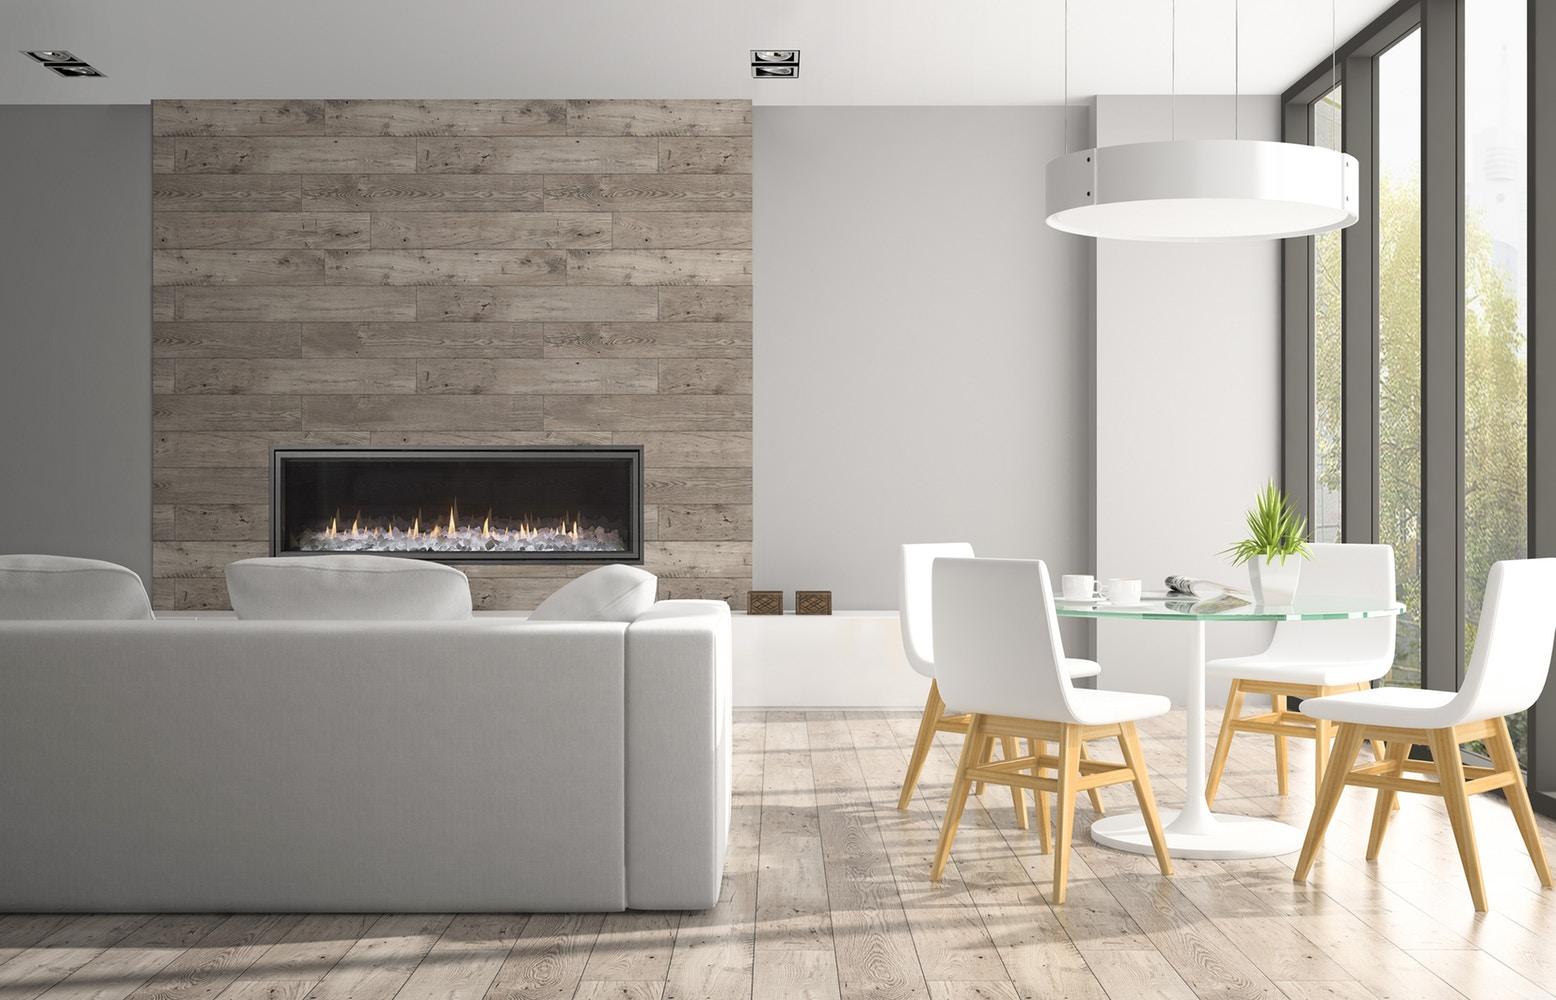 دیزاین خانه مدرن با شومینه گازی